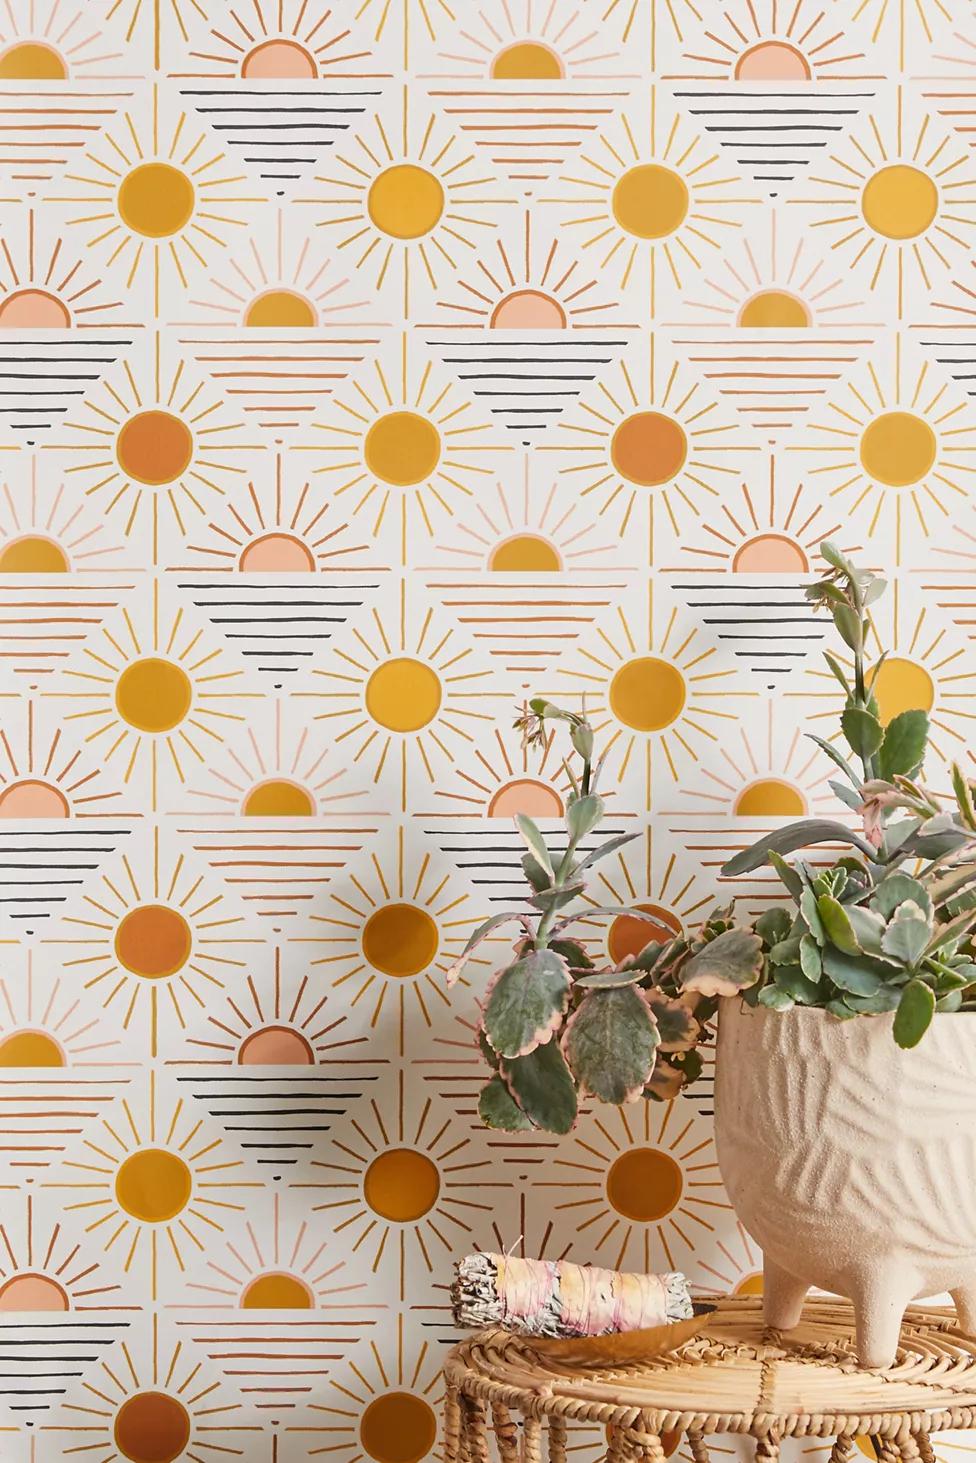 Geo Sun Removable Wallpaper Stick On Wallpaper Removable Wallpaper Cheap Home Decor